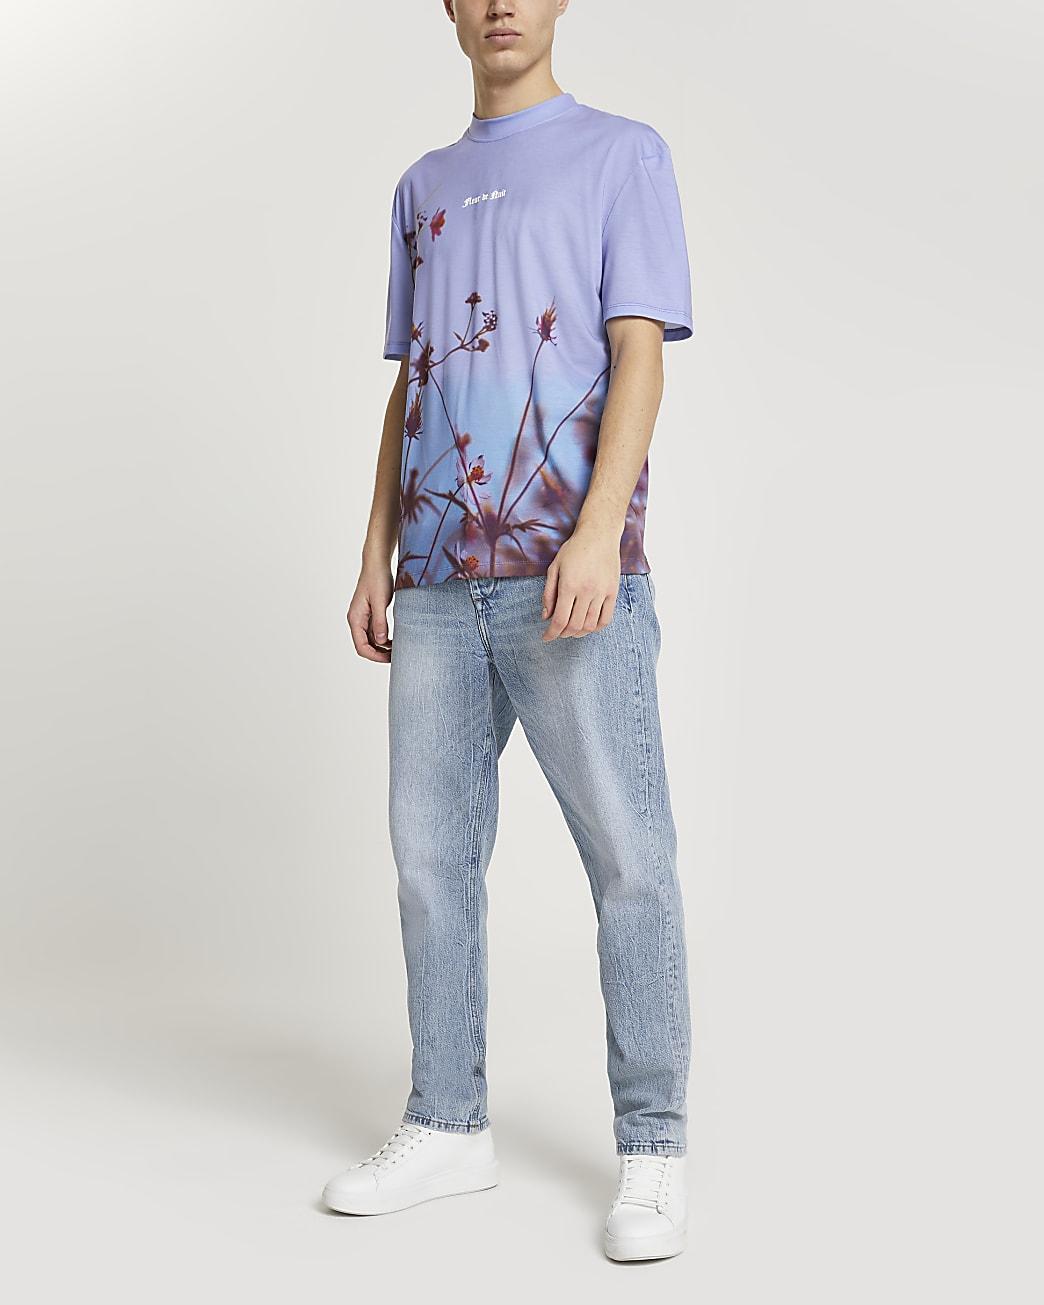 Blue floral print short sleeve t-shirt